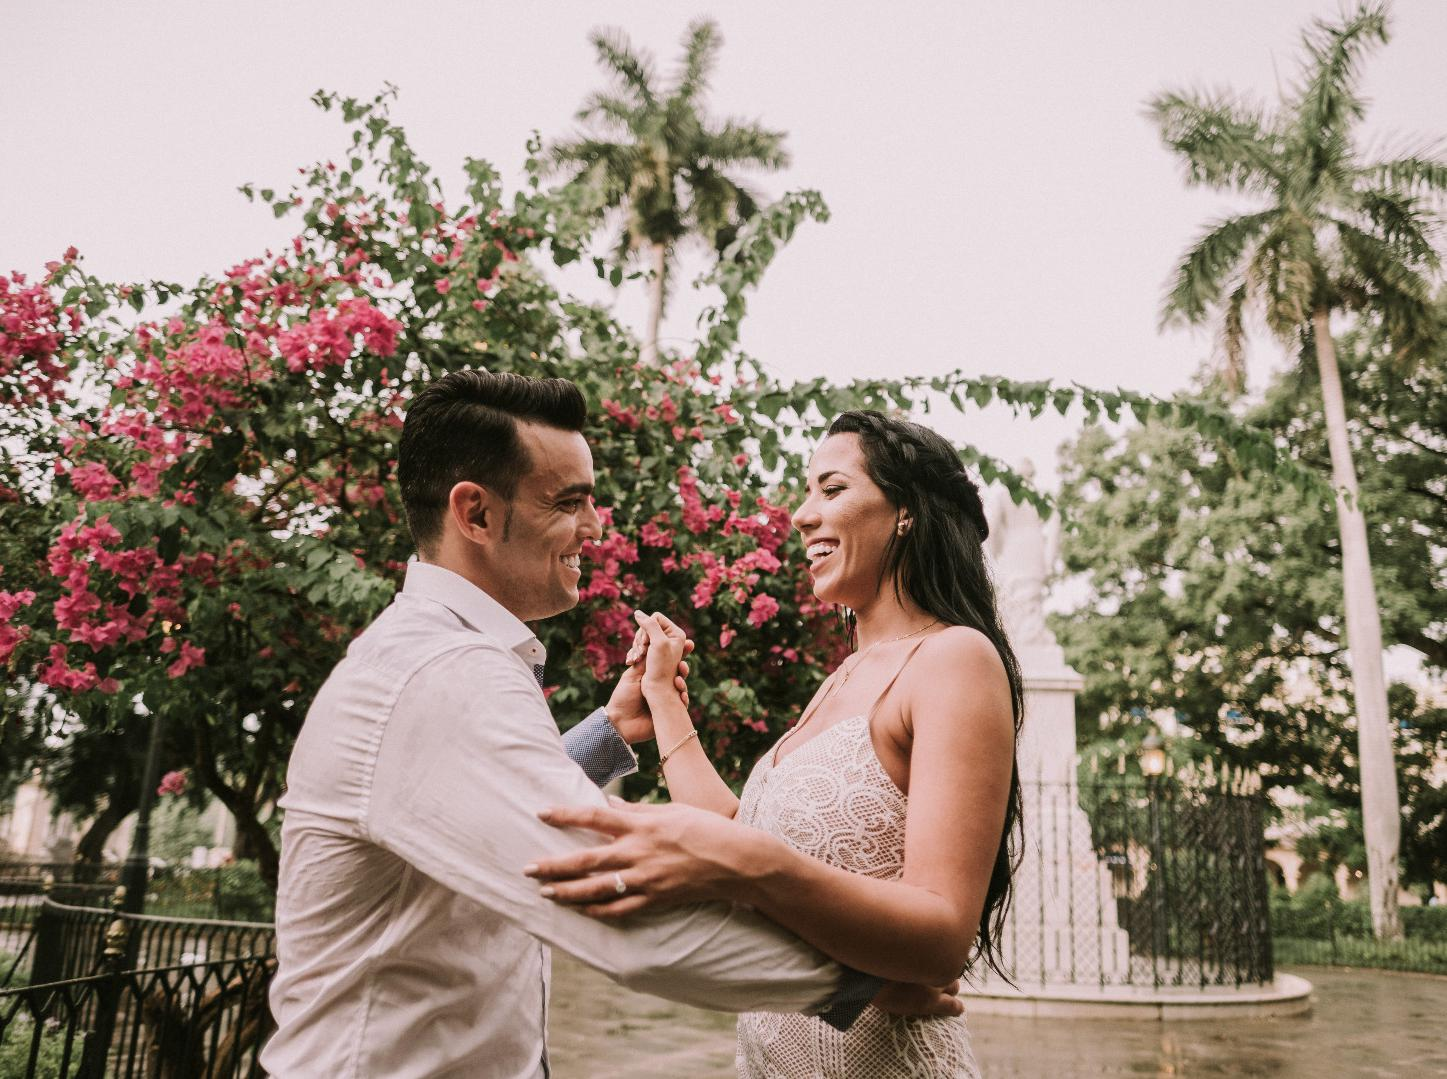 bodas-sin-clasificar-sin-tema-cuba-35262.jpg